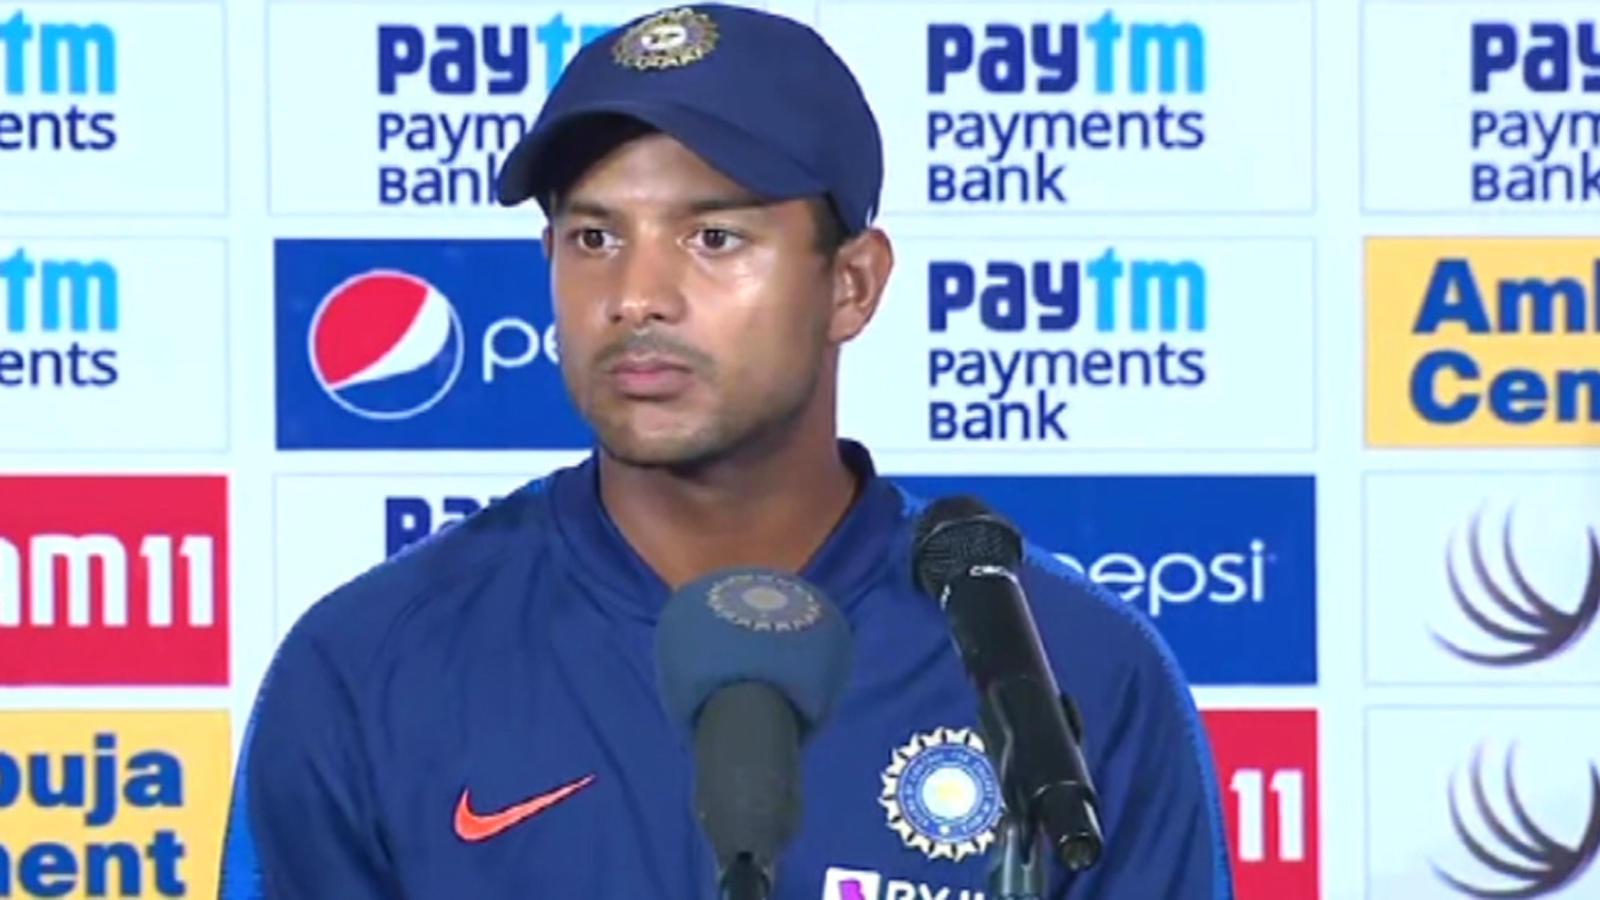 india-vs-sa-partnership-between-virat-kohli-ravindra-jadeja-was-fabulous-says-mayank-agarwal